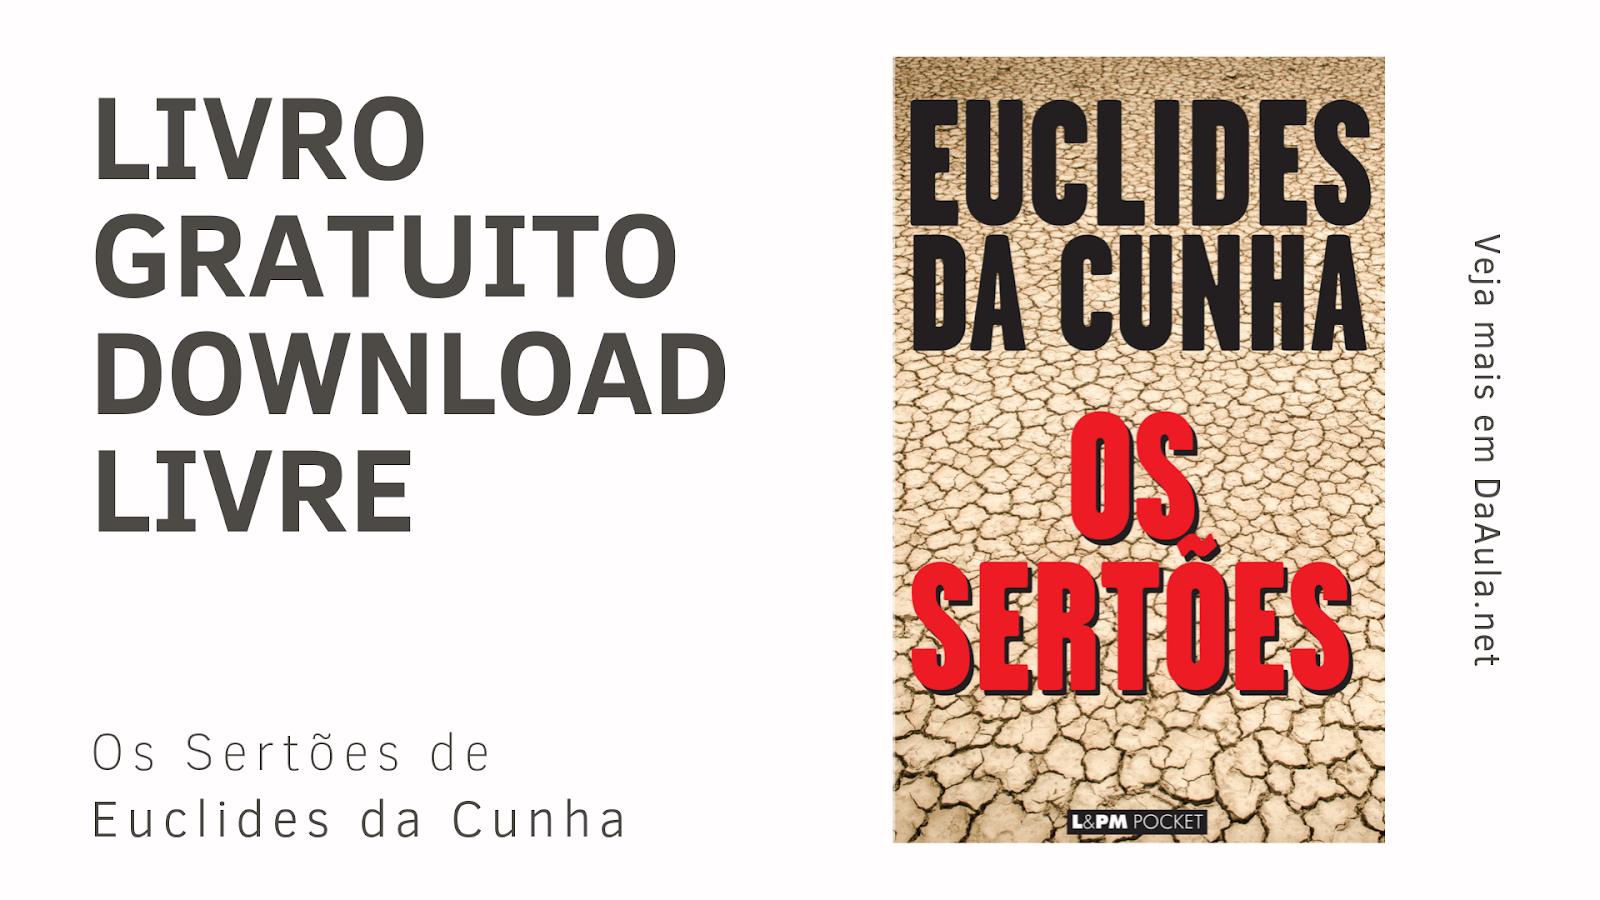 Livro: Os Sertões de Euclides da Cunha